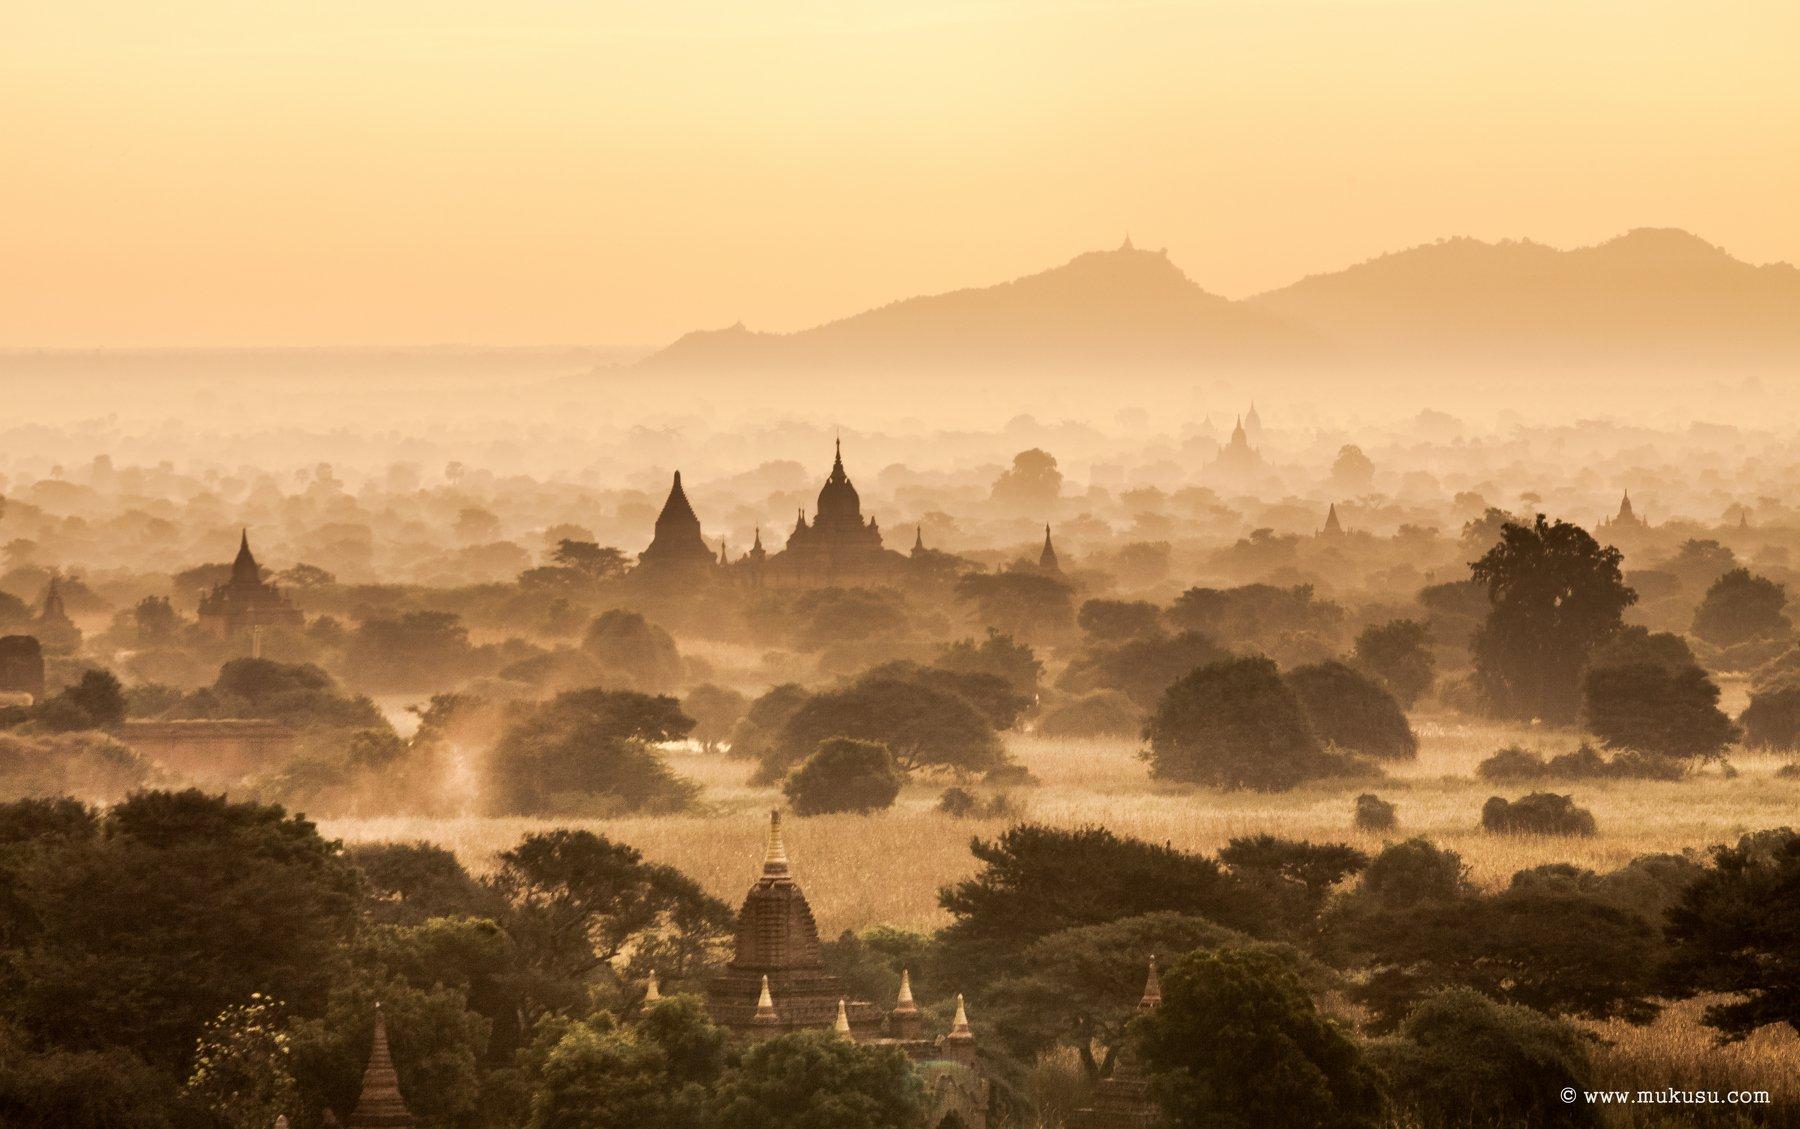 бирма, мьянма, баган,путешествия,рассвет, Алексей Самойленко